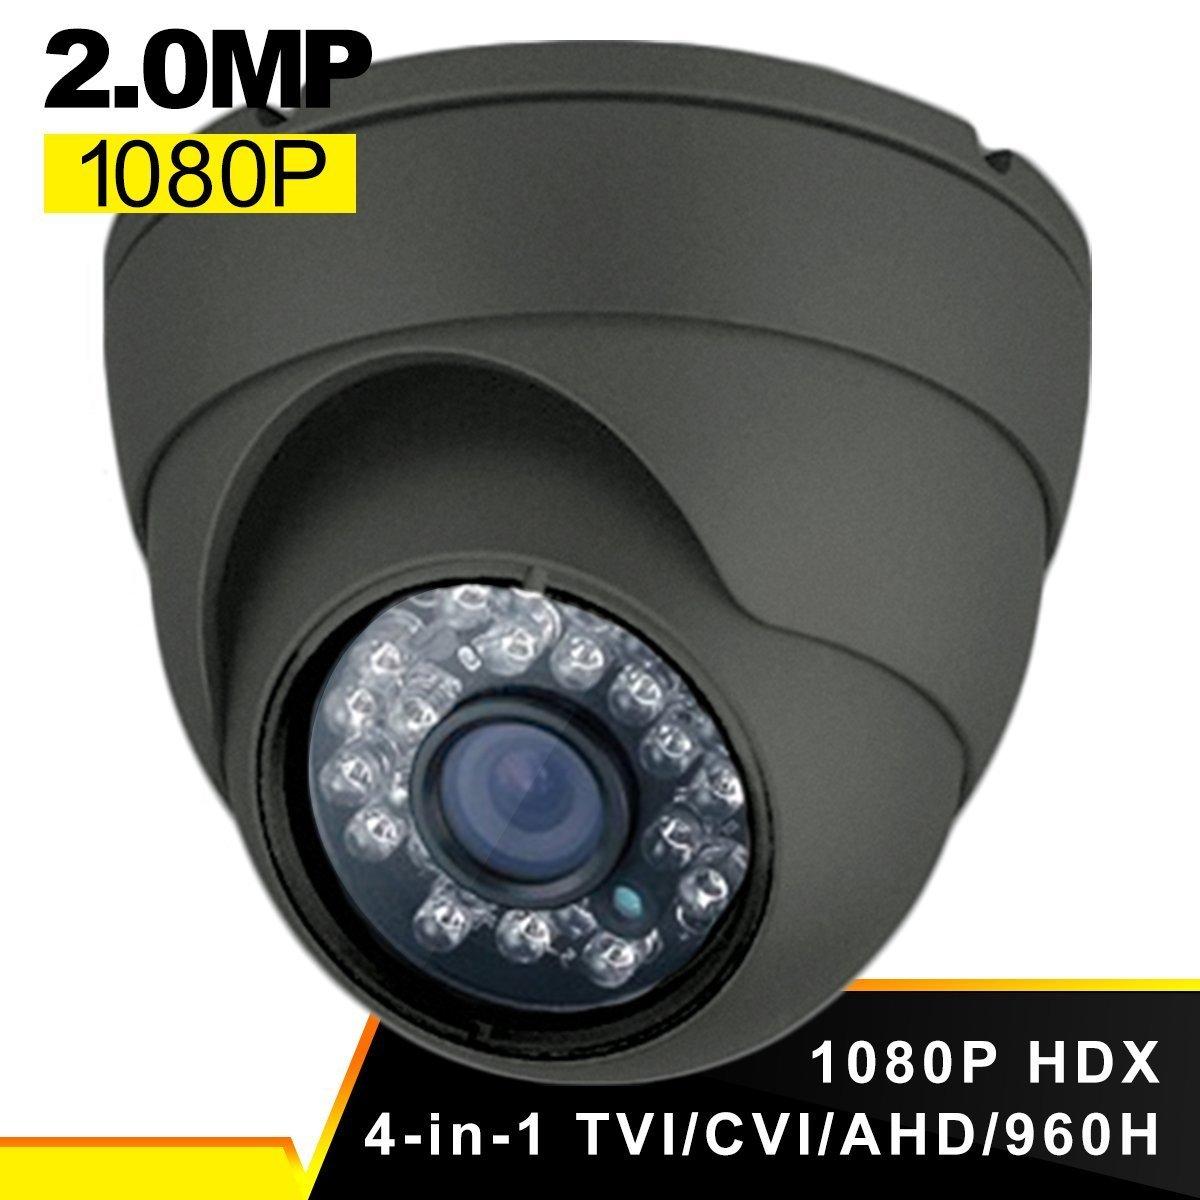 amazon com security camera savvypixel 1080p 4 in 1 tvi cvi cvbs